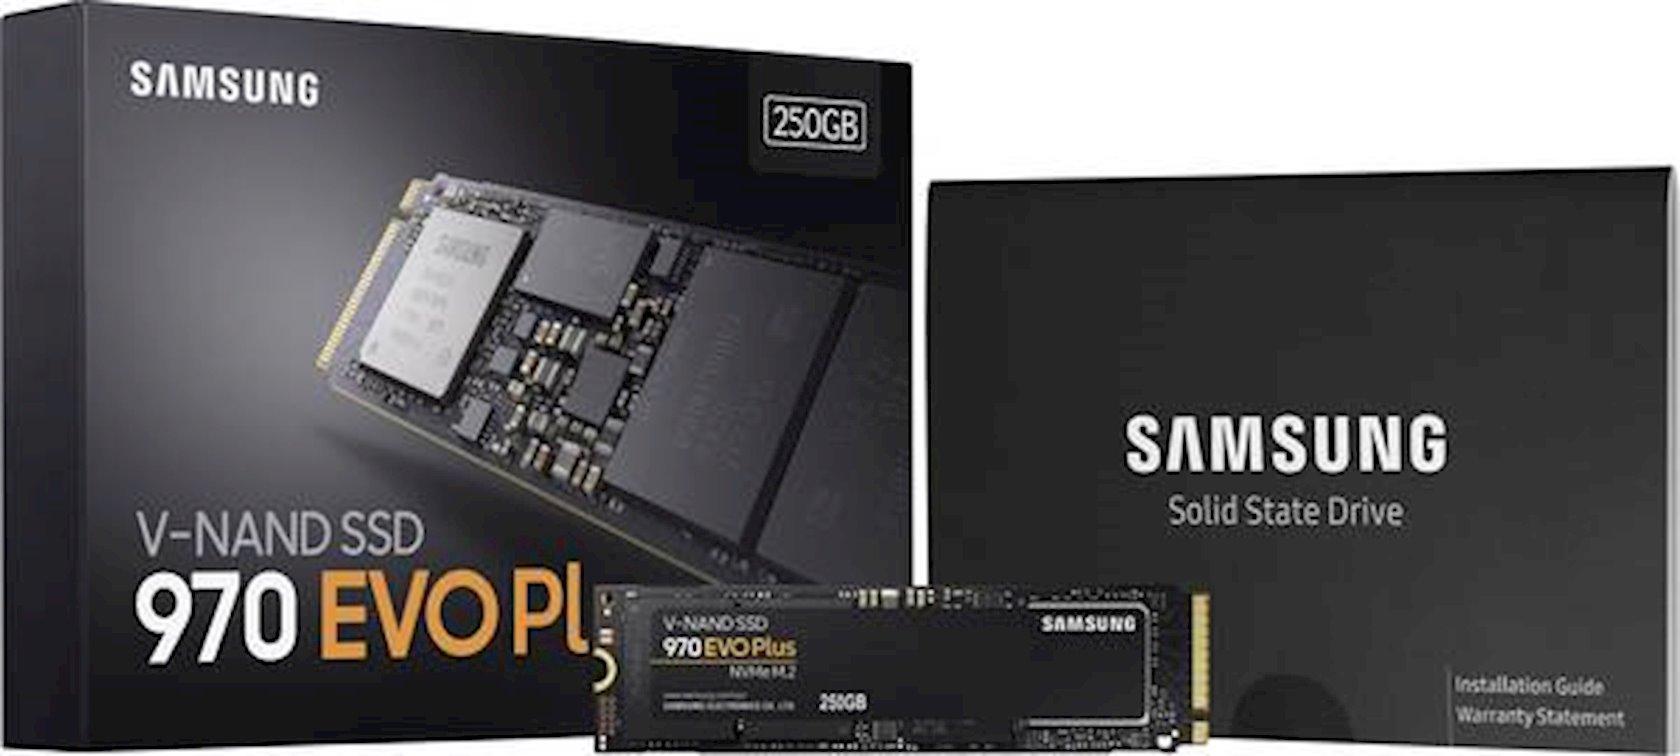 Sərt disk Samsung SSD S.970 Evo Plus 250GB